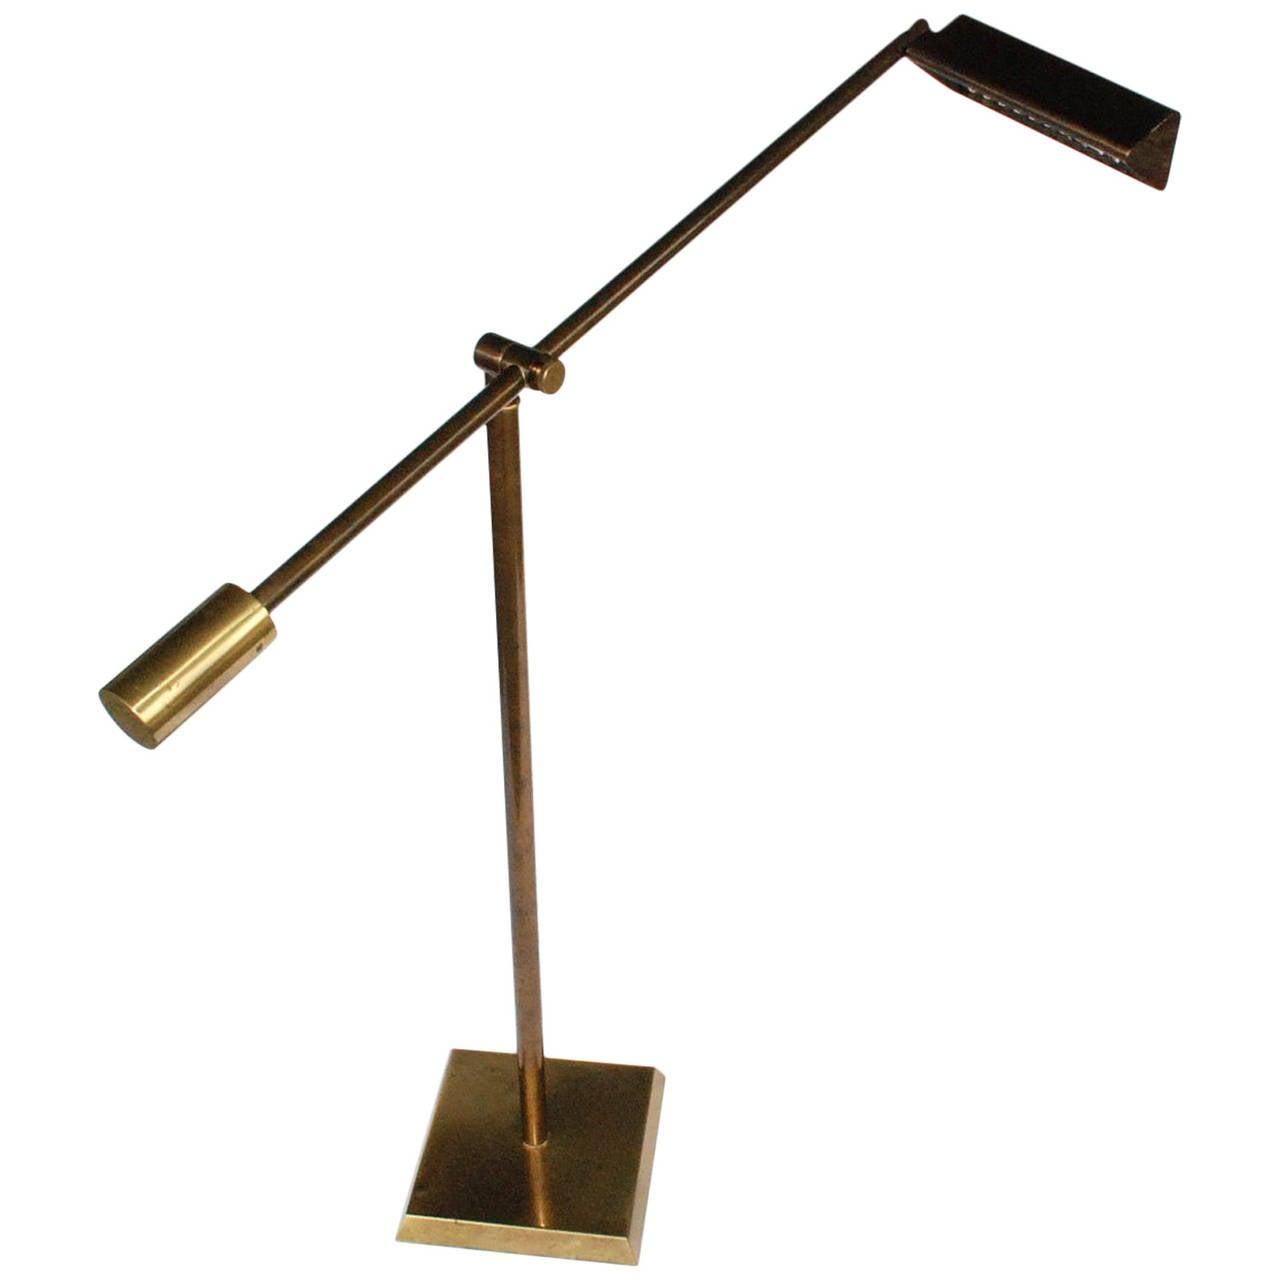 Vintage frederick cooper brass floor lamp at 1stdibs for Antique brass floor lamp value